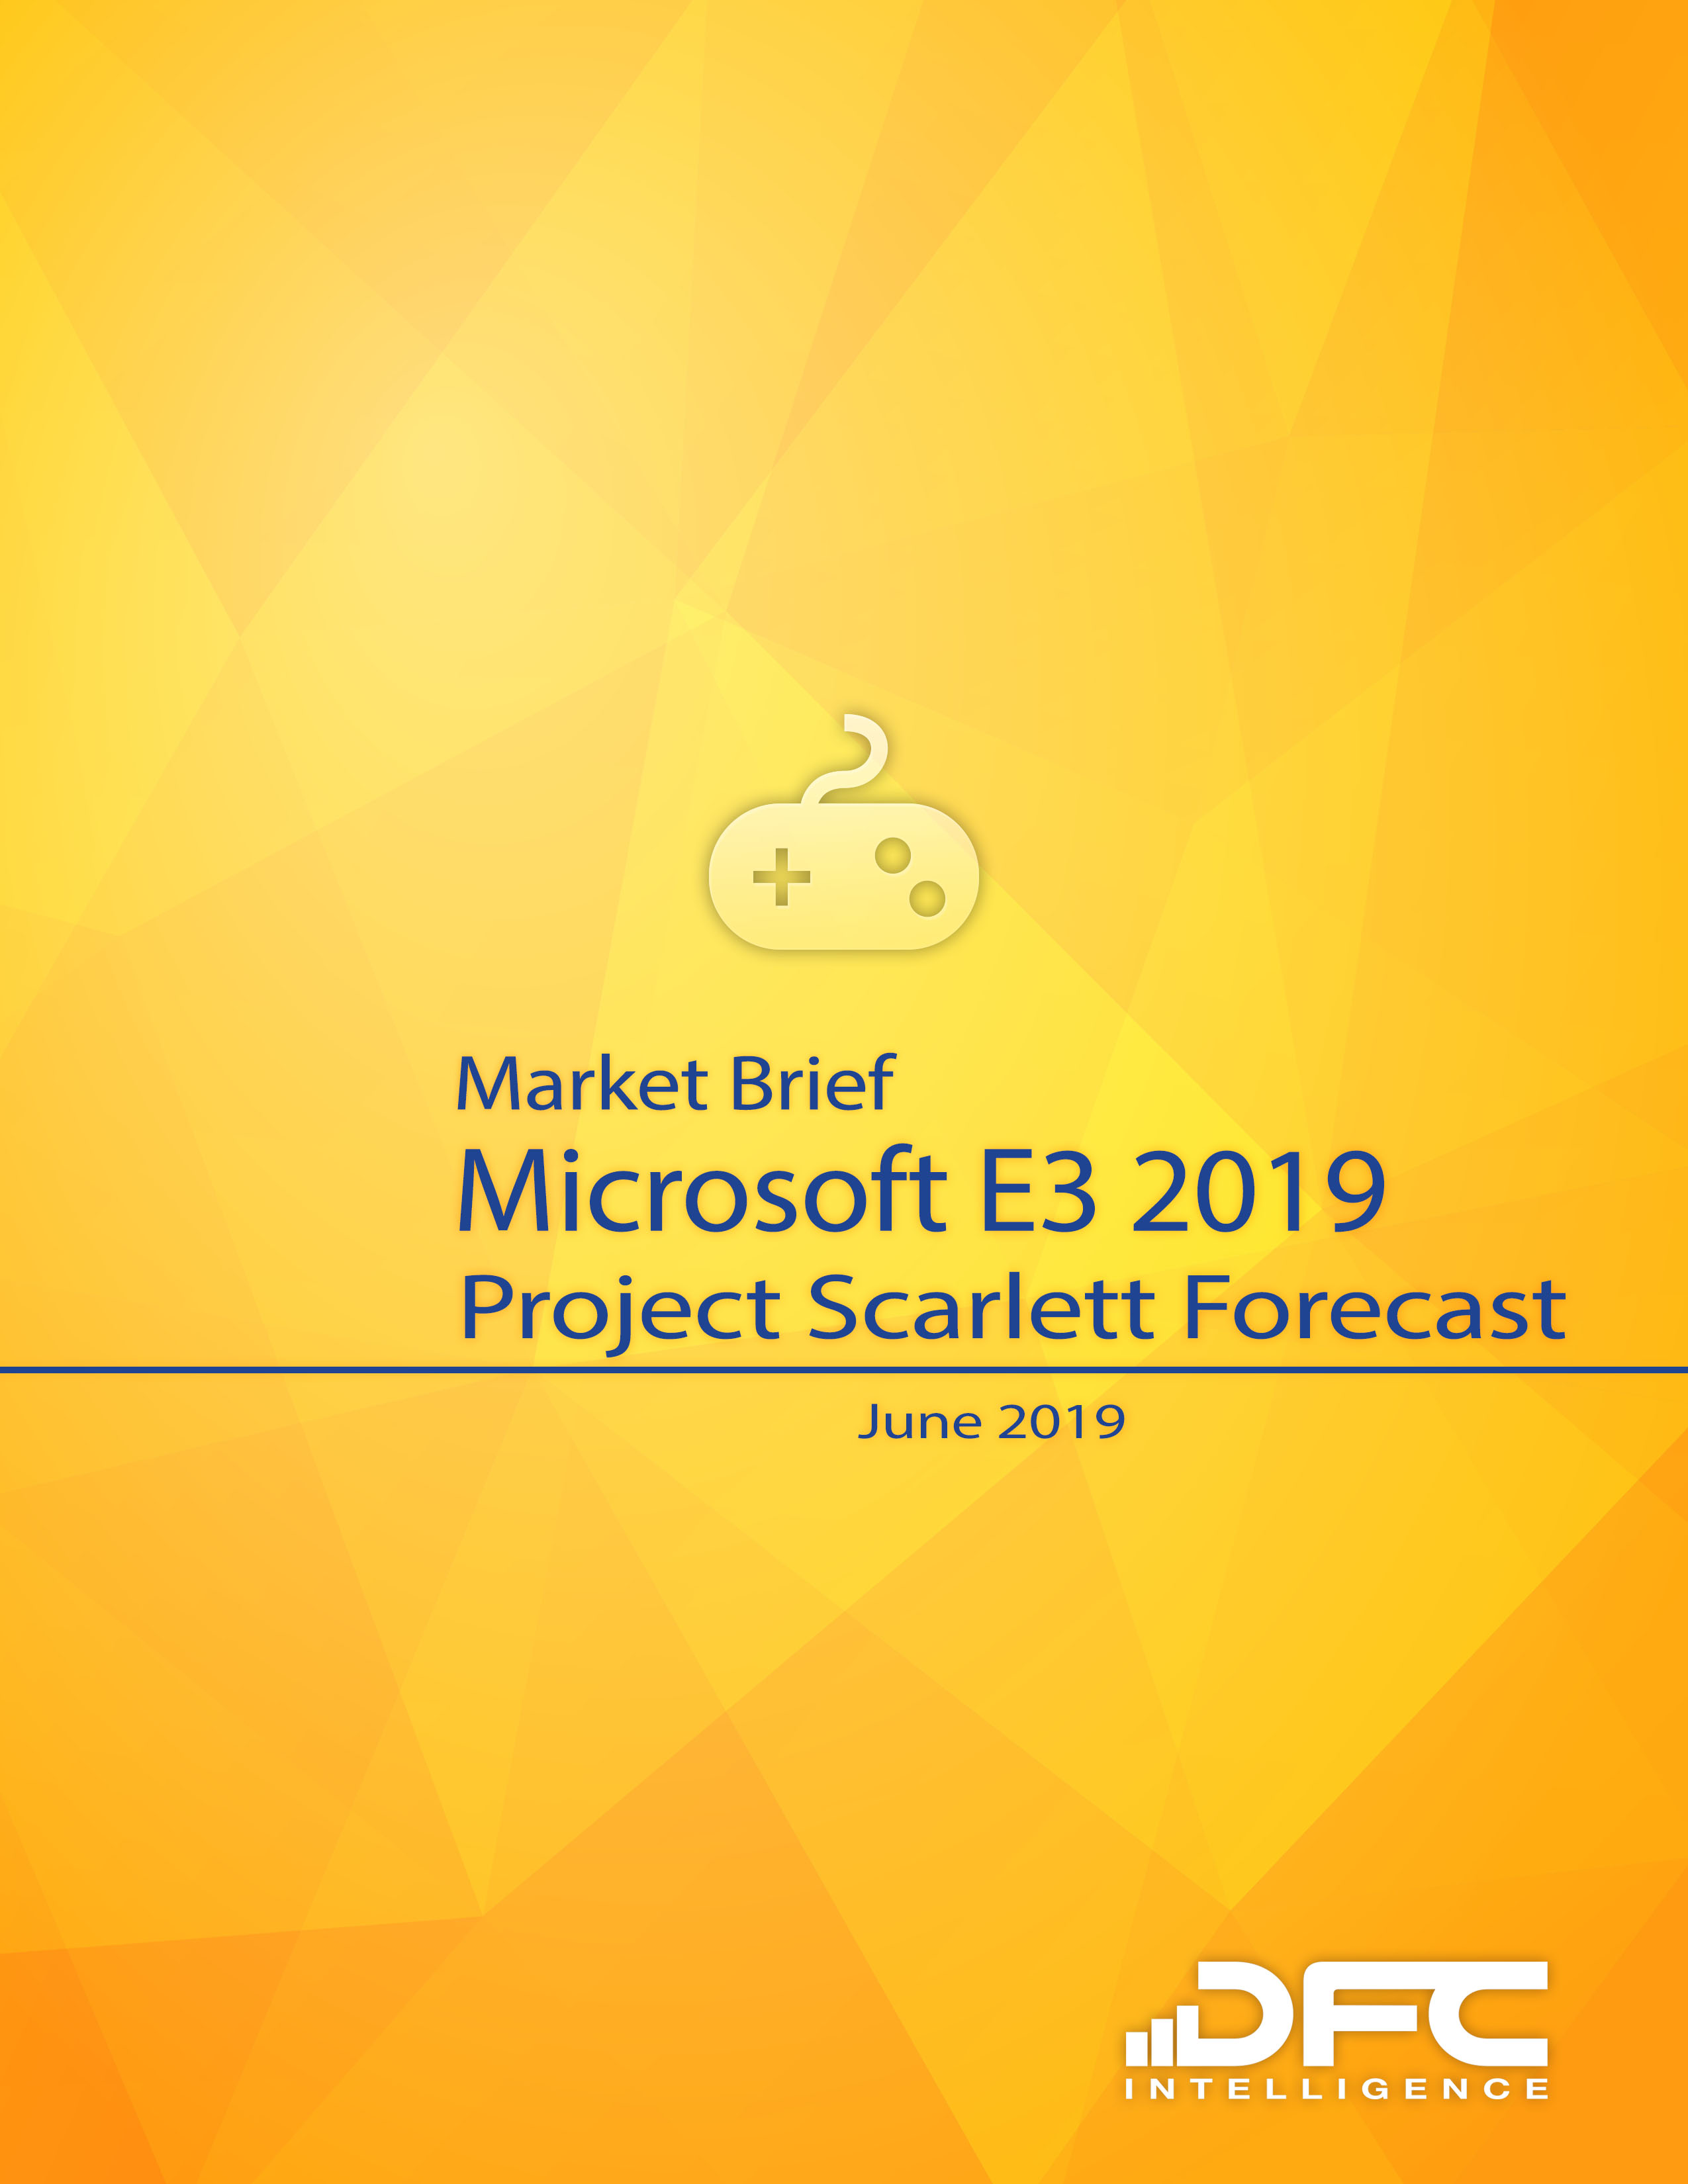 Microsoft Announces New Project Scarlett Game Console